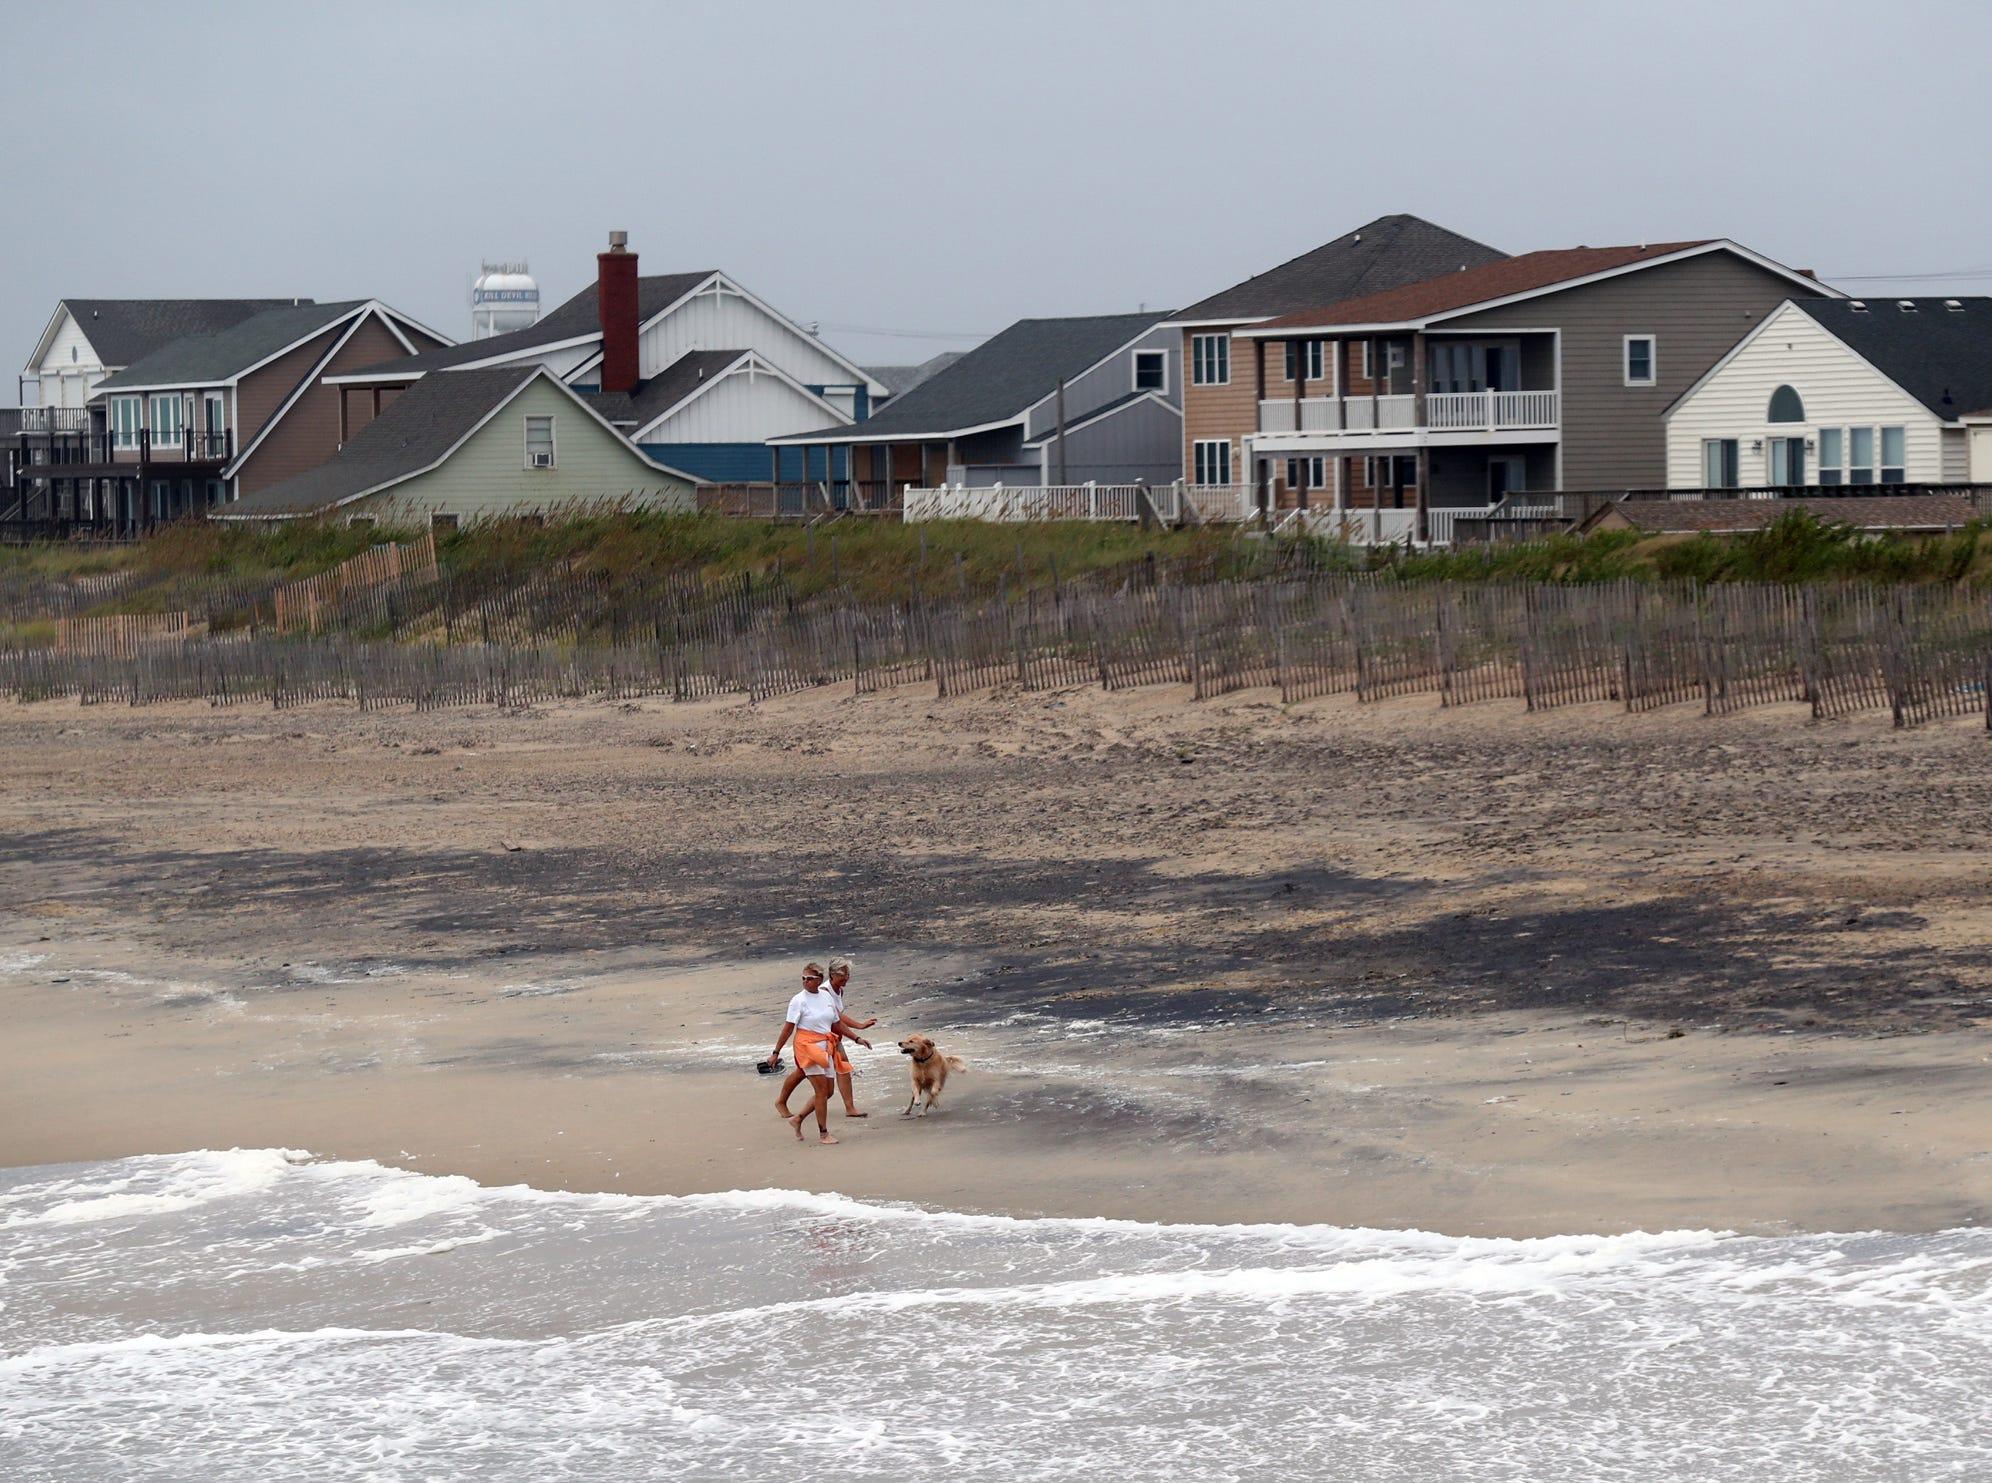 September 14, 2018; Kill Devil Hills, NC, USA; Local residents walk along the beach in Kill Devil Hills, North Carolina on Friday, September 14, 2018.